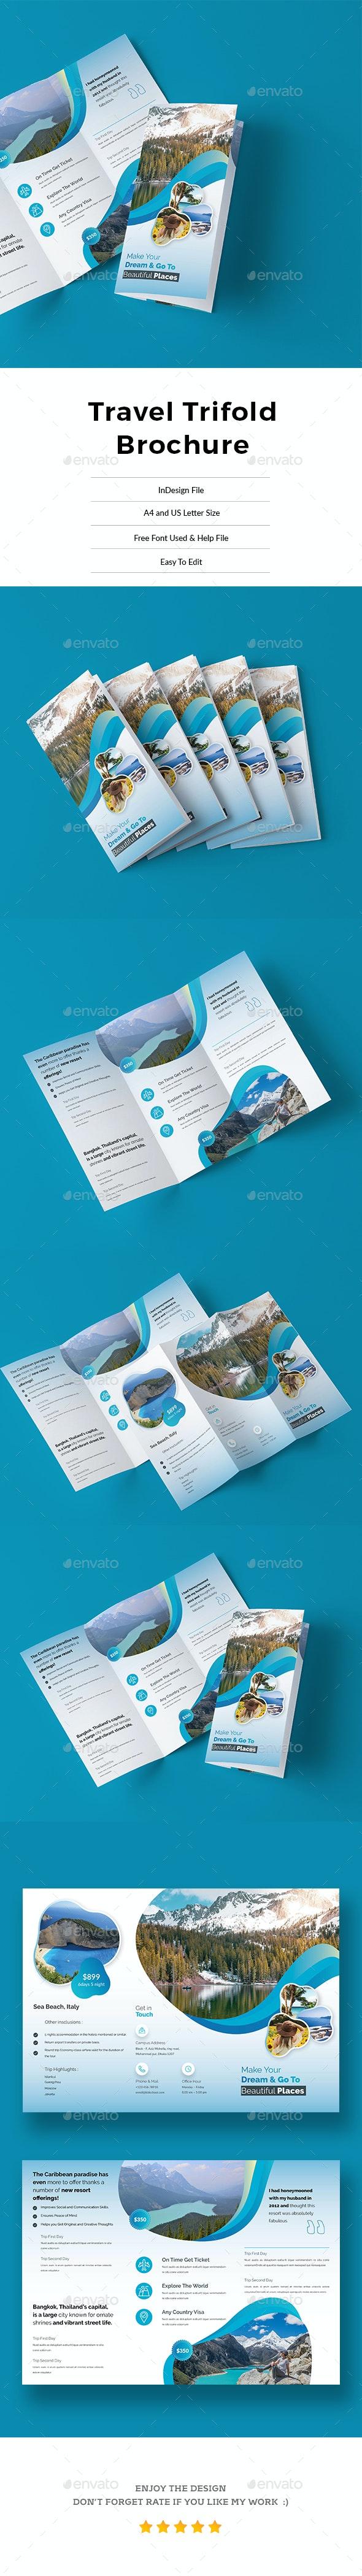 Travel TriFold Brochure - Informational Brochures